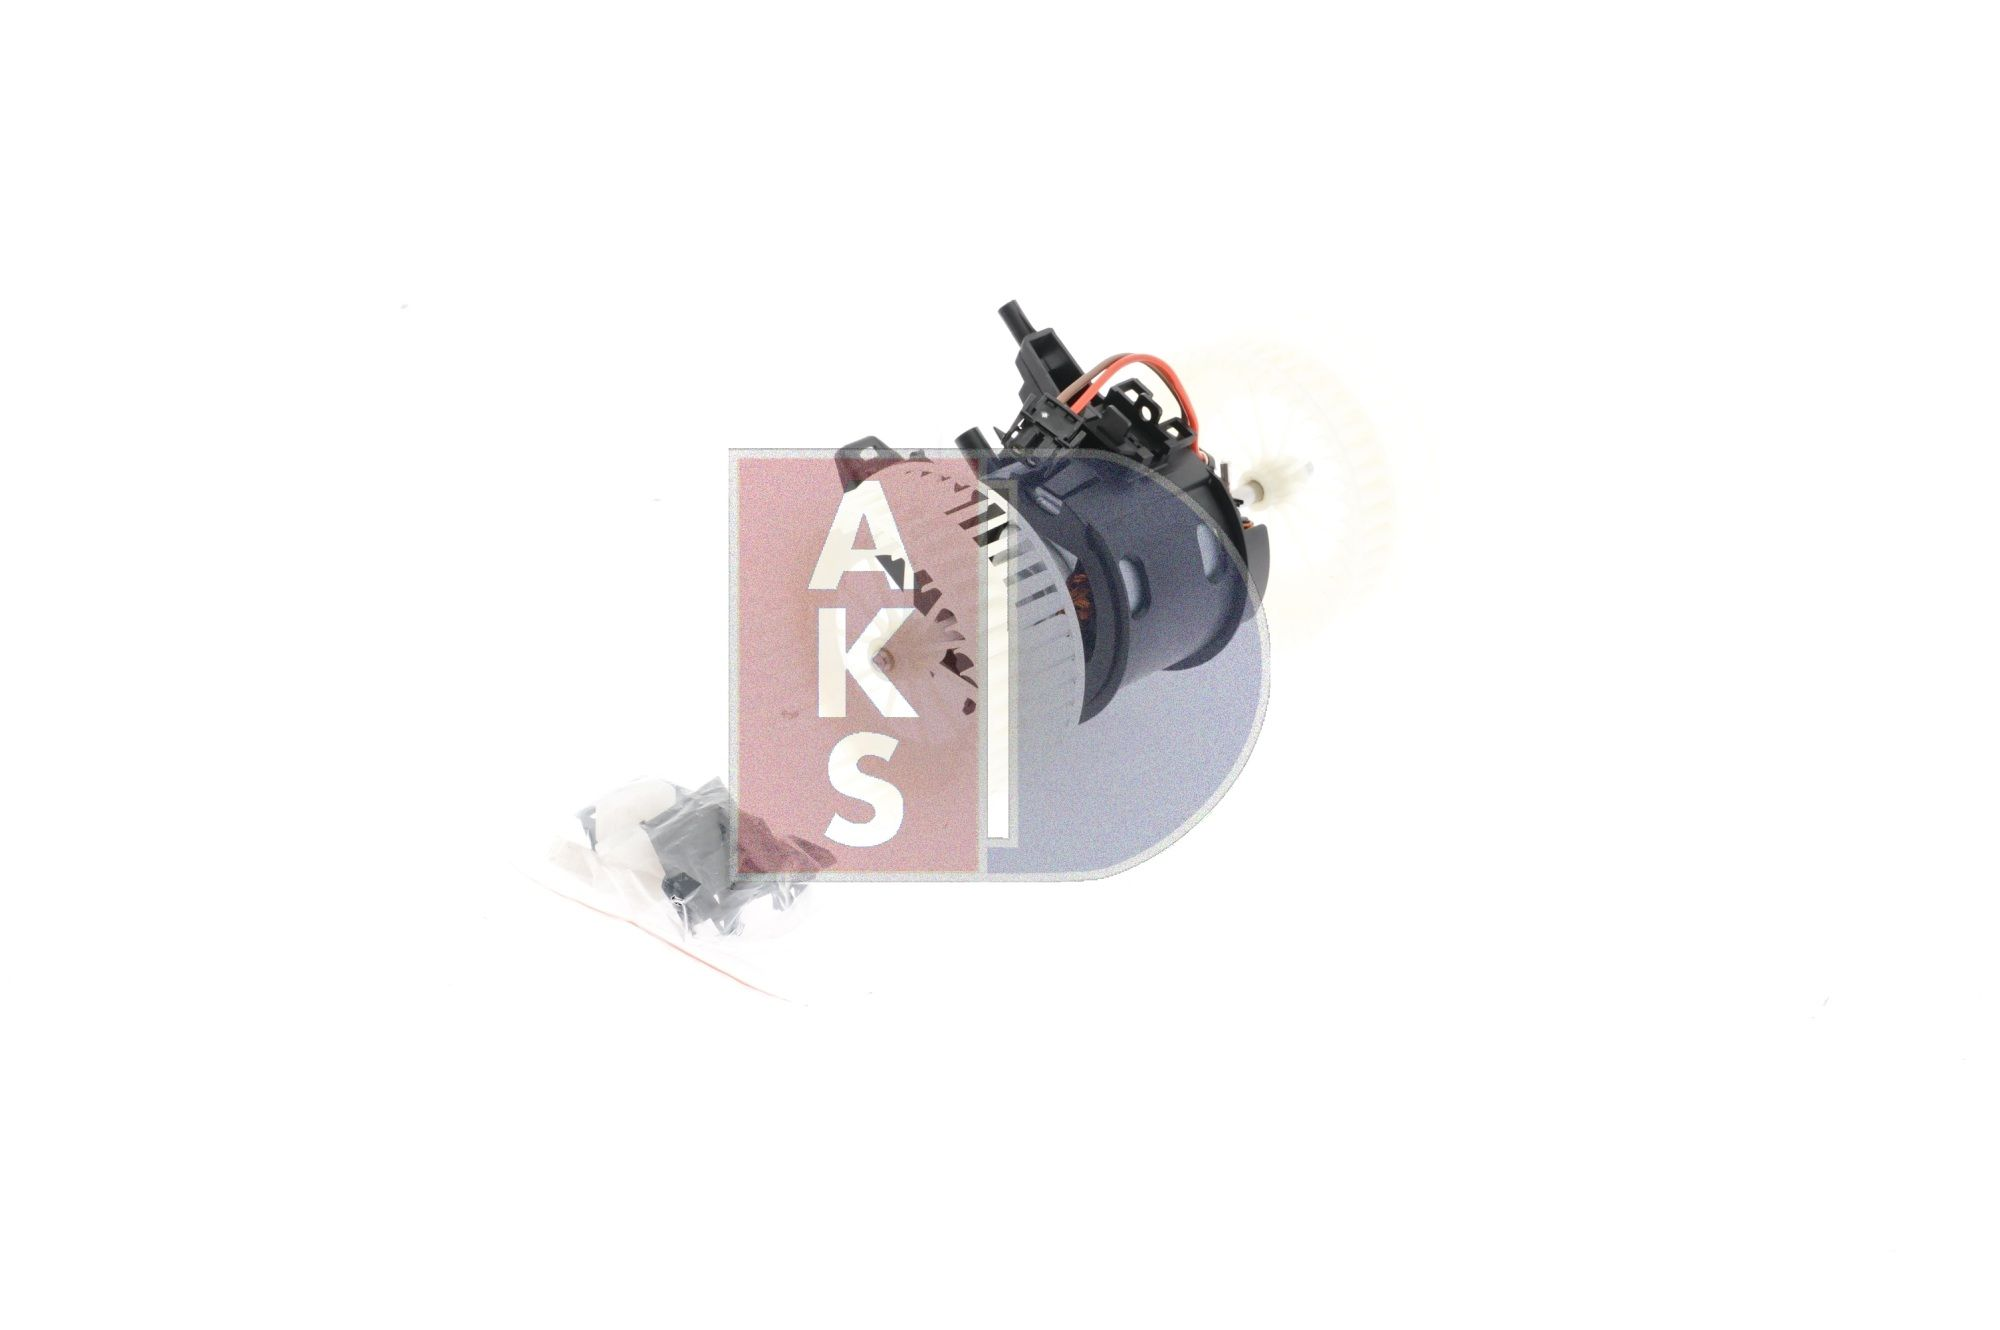 Lüftermotor AKS DASIS 870046N Erfahrung